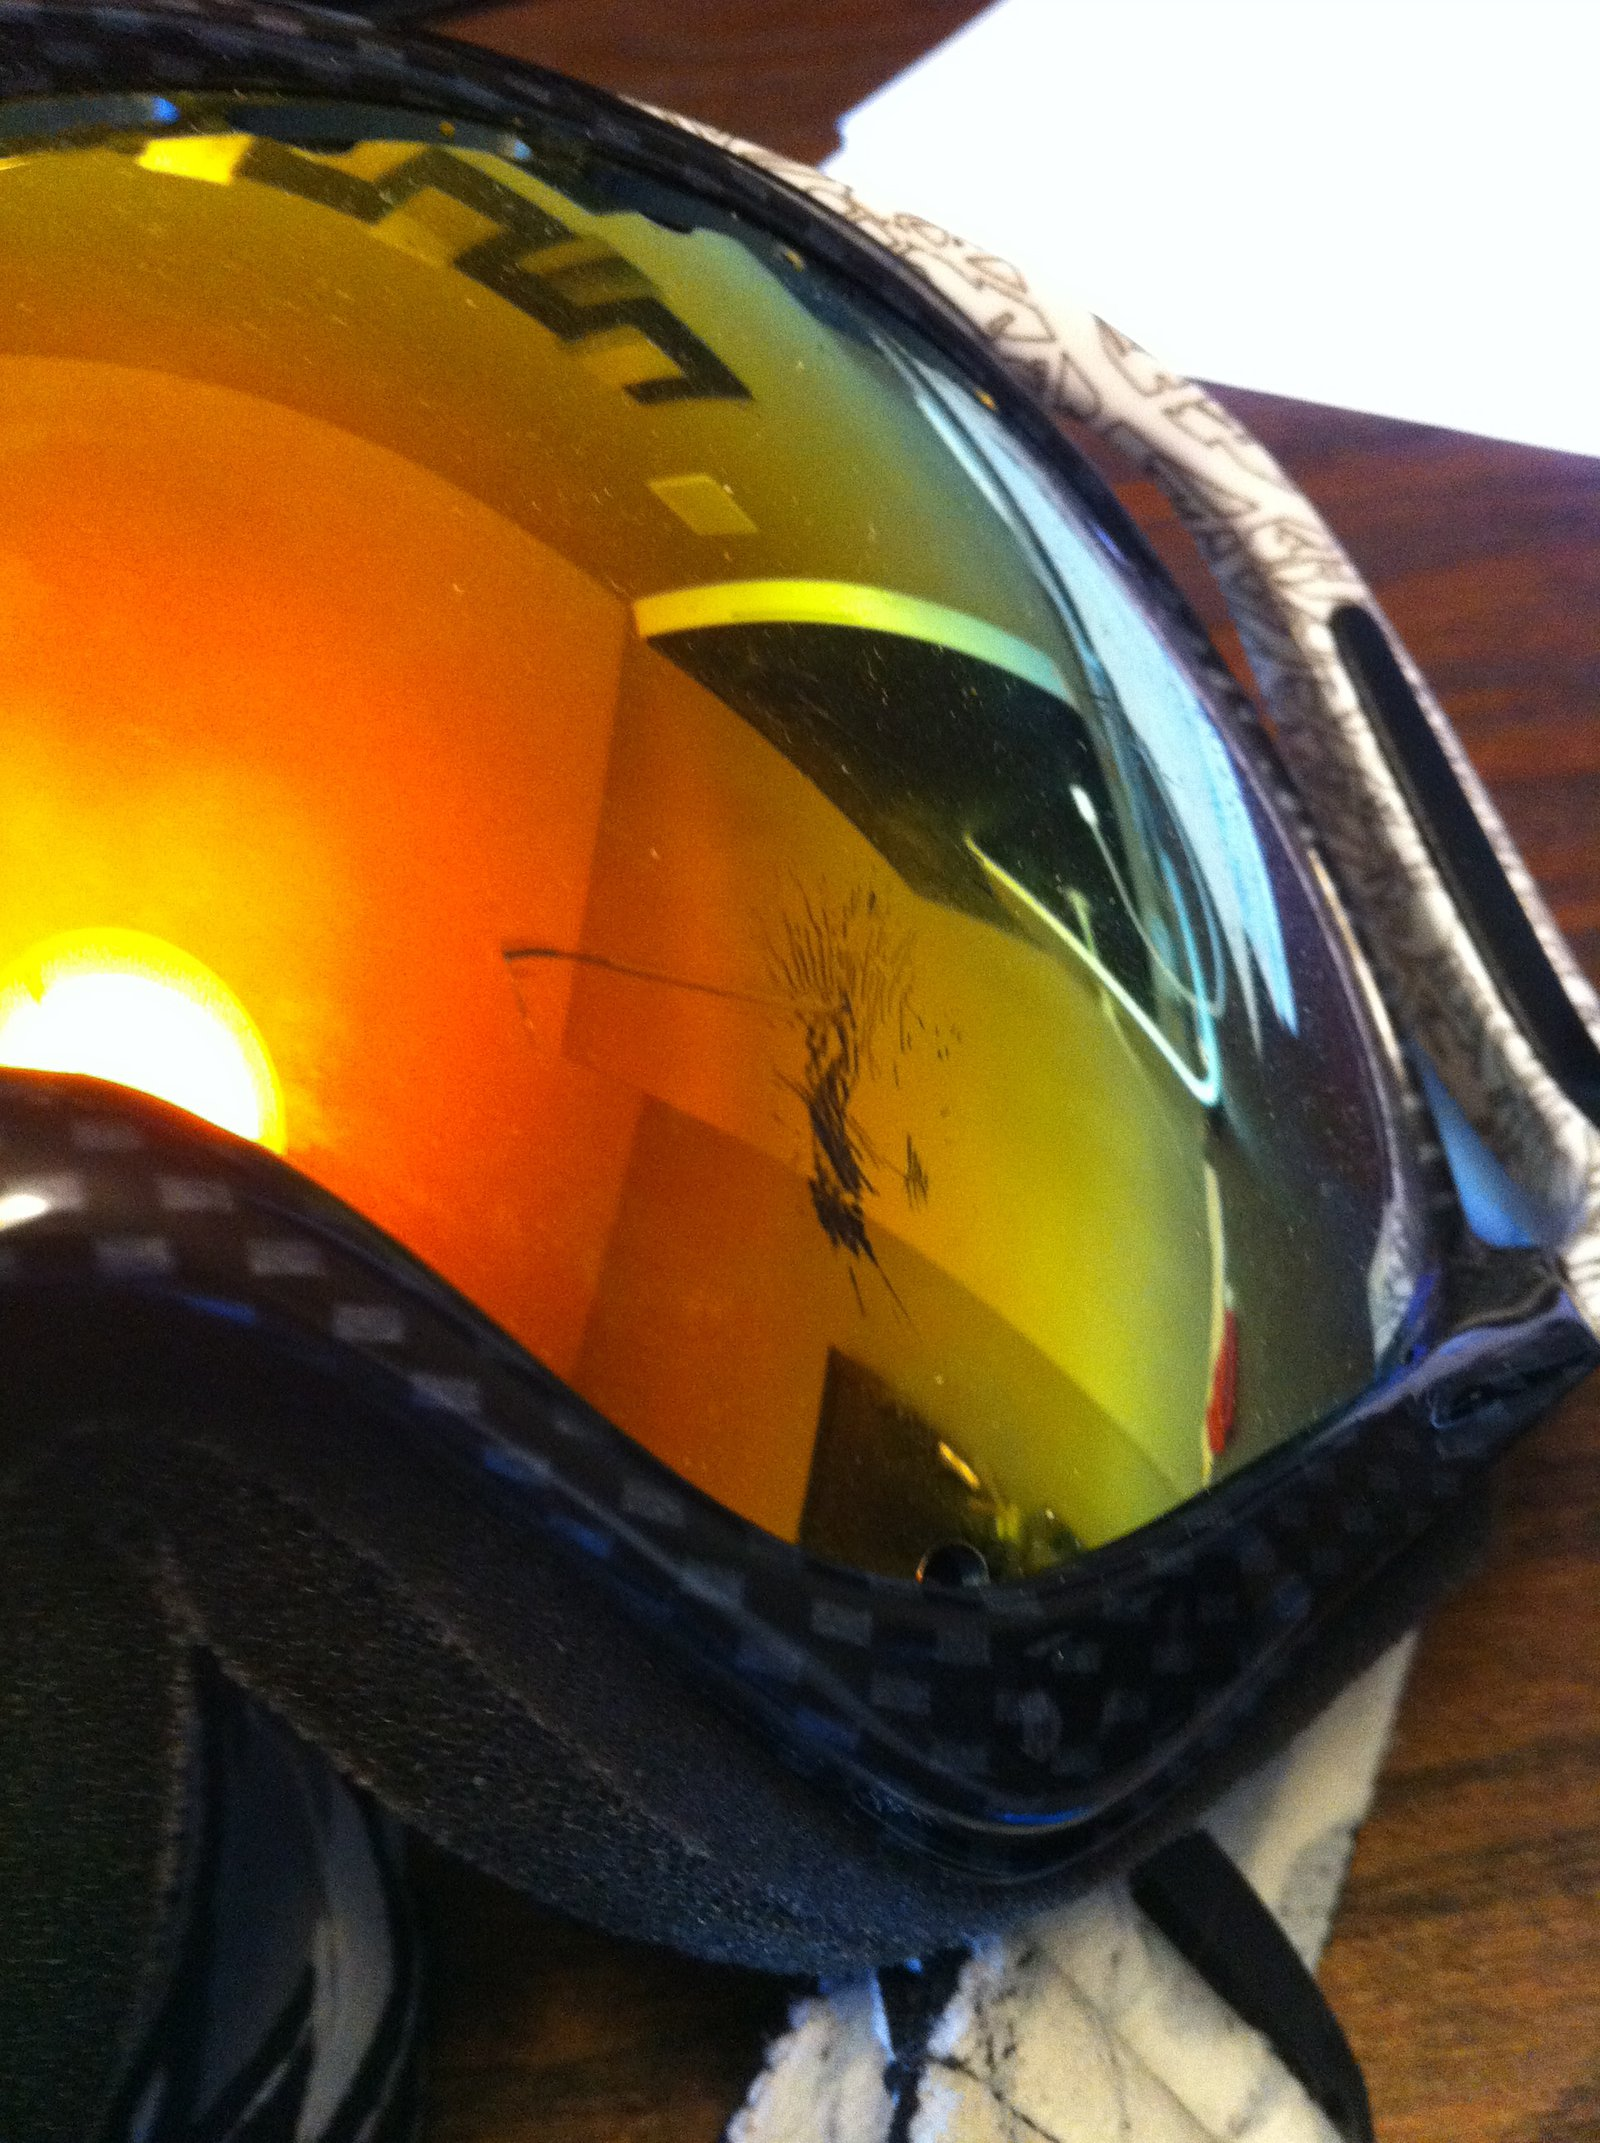 Scuff marks/scratch on goggles